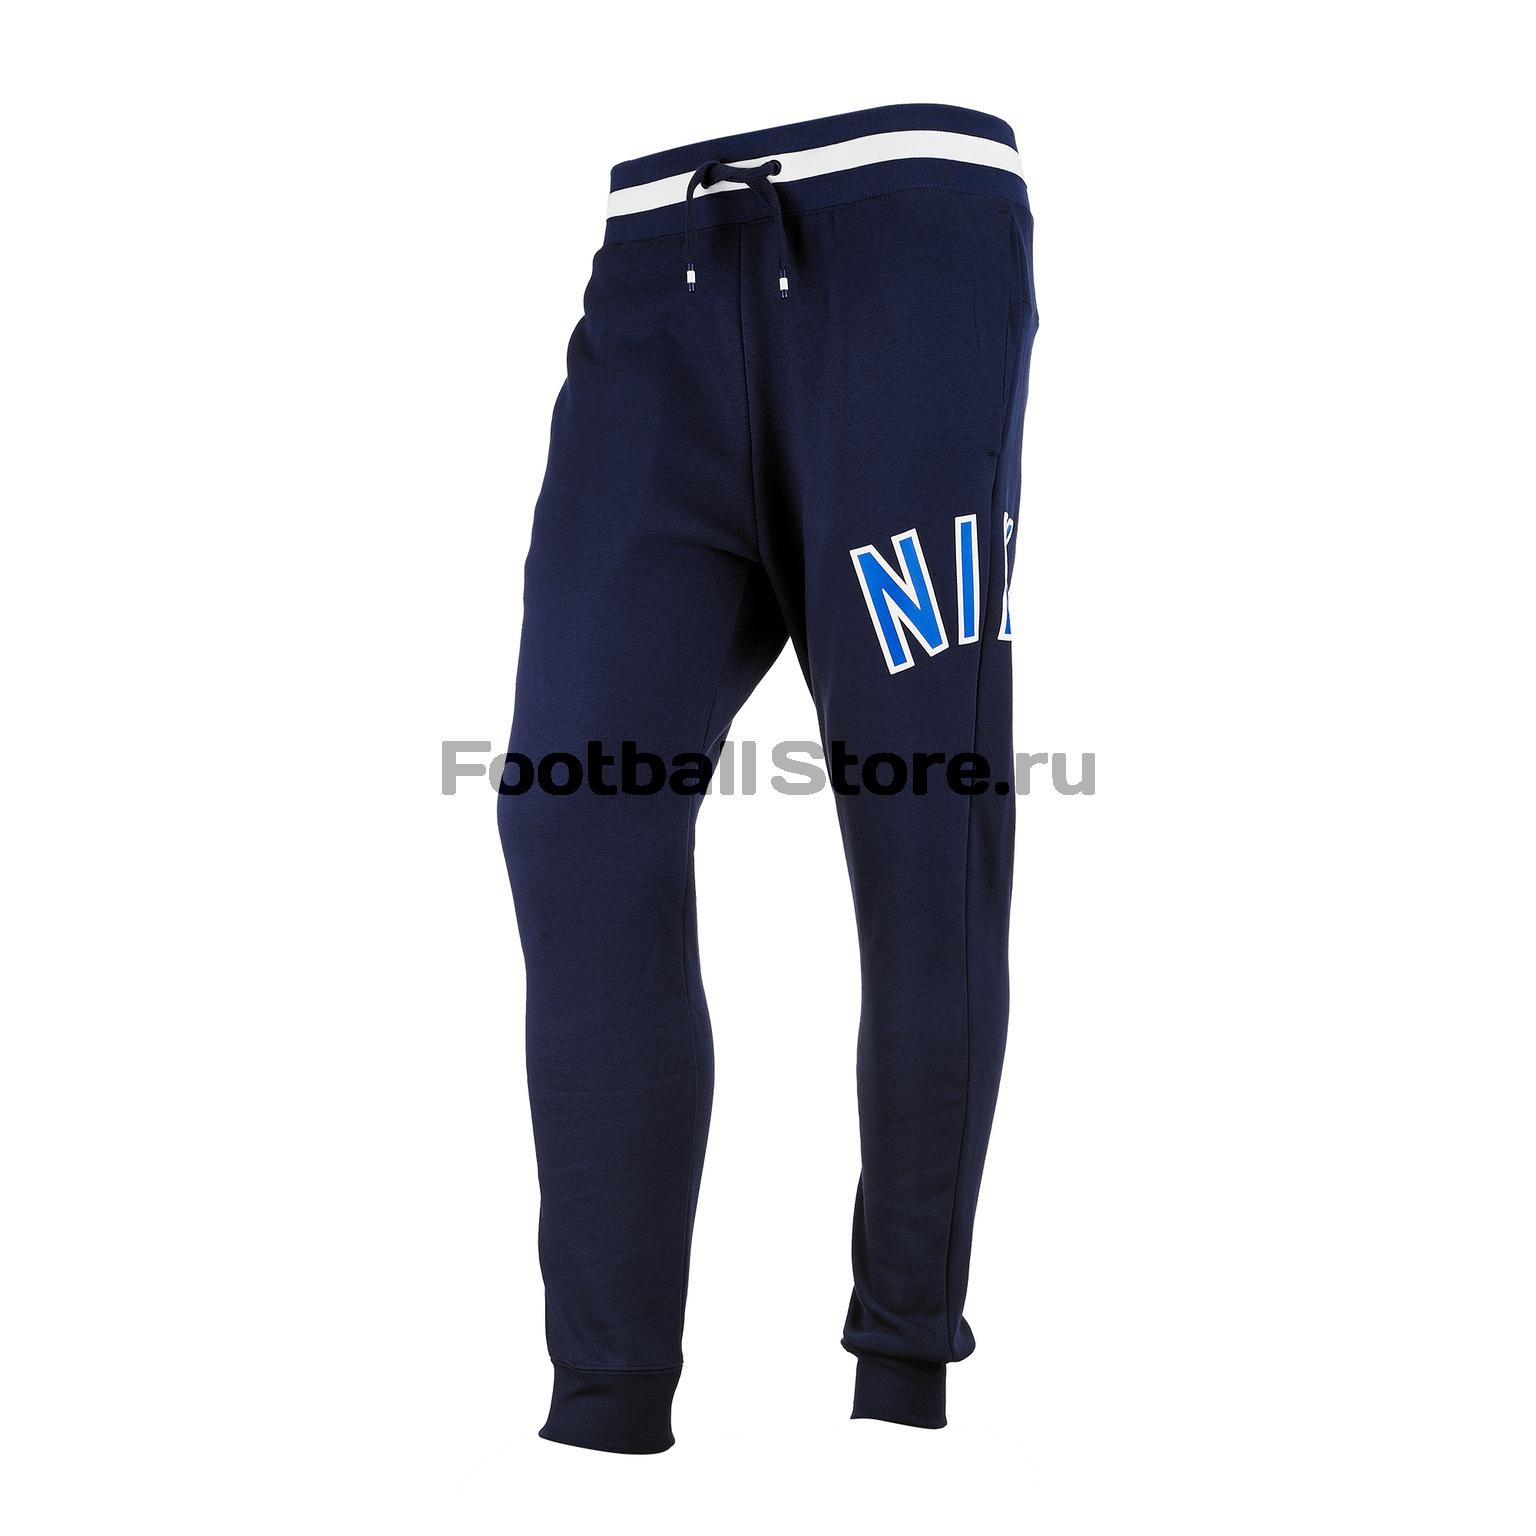 3b23e950 Брюки Nike NSW Nike Air Pant AR1824-451 – купить в интернет магазине  footballstore, цена, фото